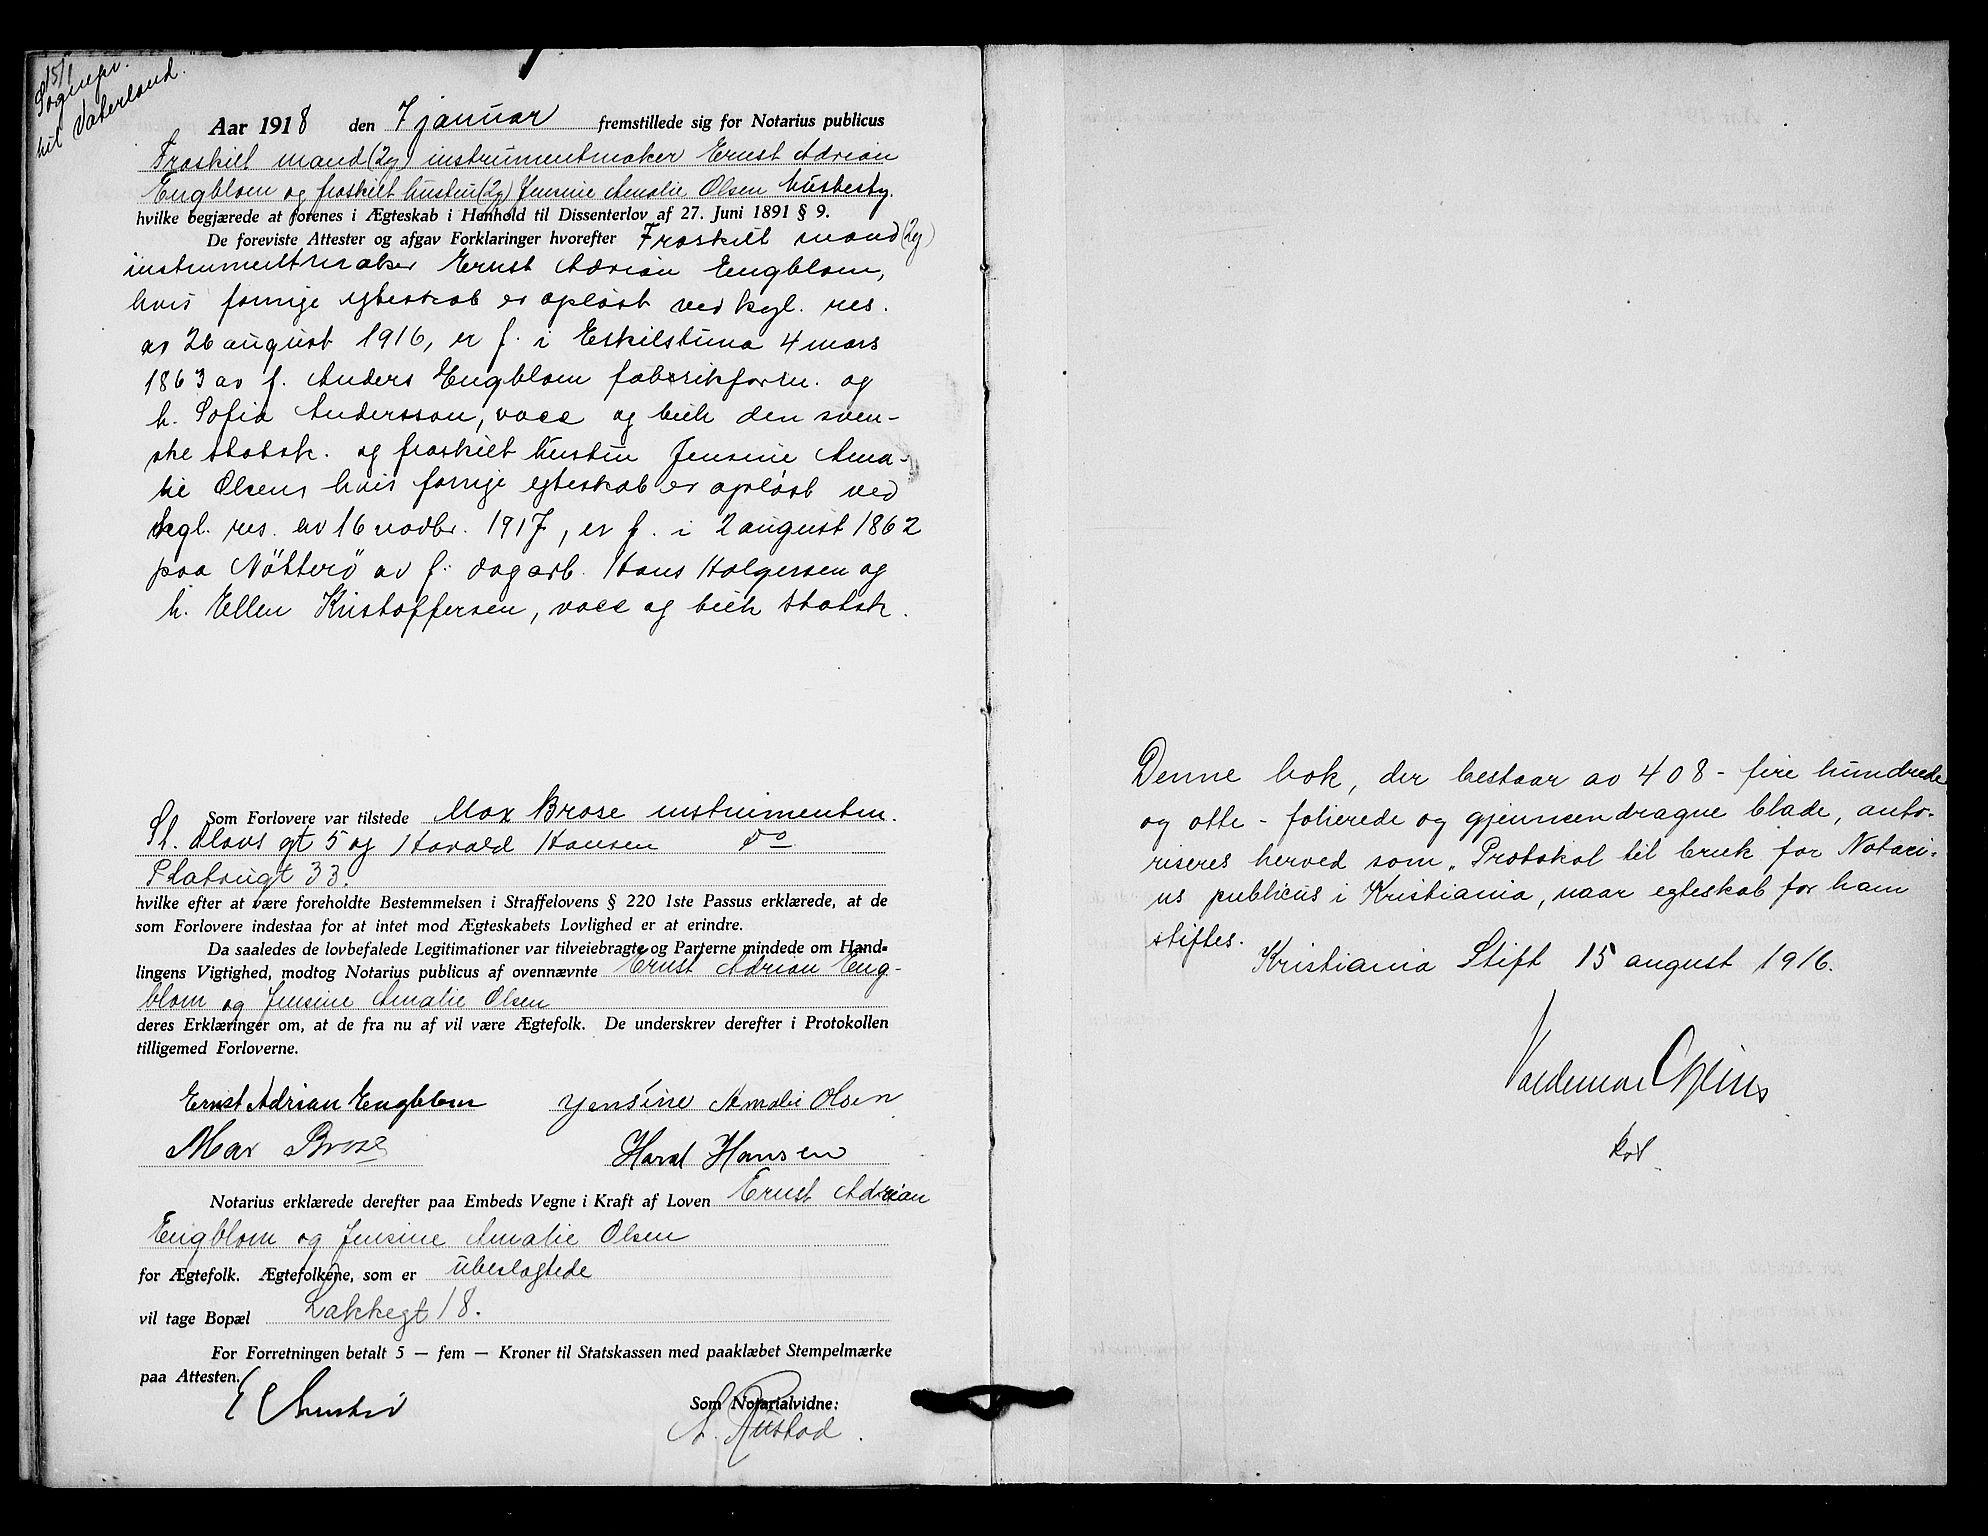 SAO, Oslo byfogd avd. I, L/Lb/Lbb/L0011: Notarialprotokoll, rekke II: Vigsler, 1916-1918, s. 408b-409a